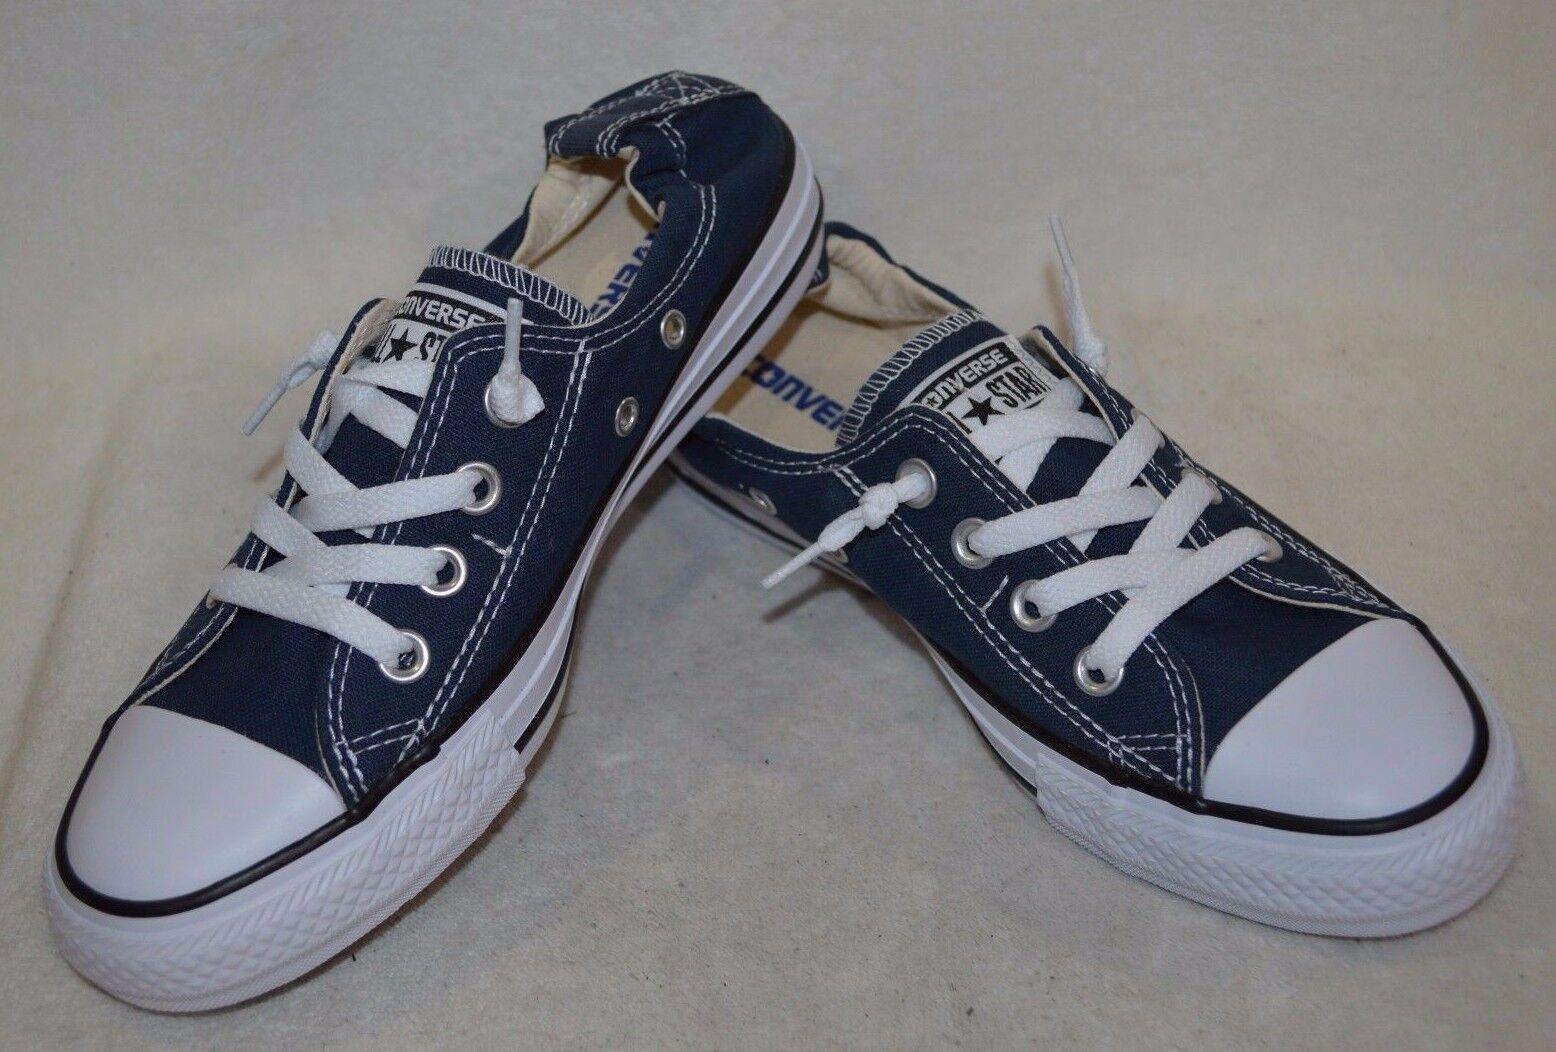 Converse Women's CT AS Shoreline Navy White Slip On Sneaker - Sizes 6 7 8 9 -NWB